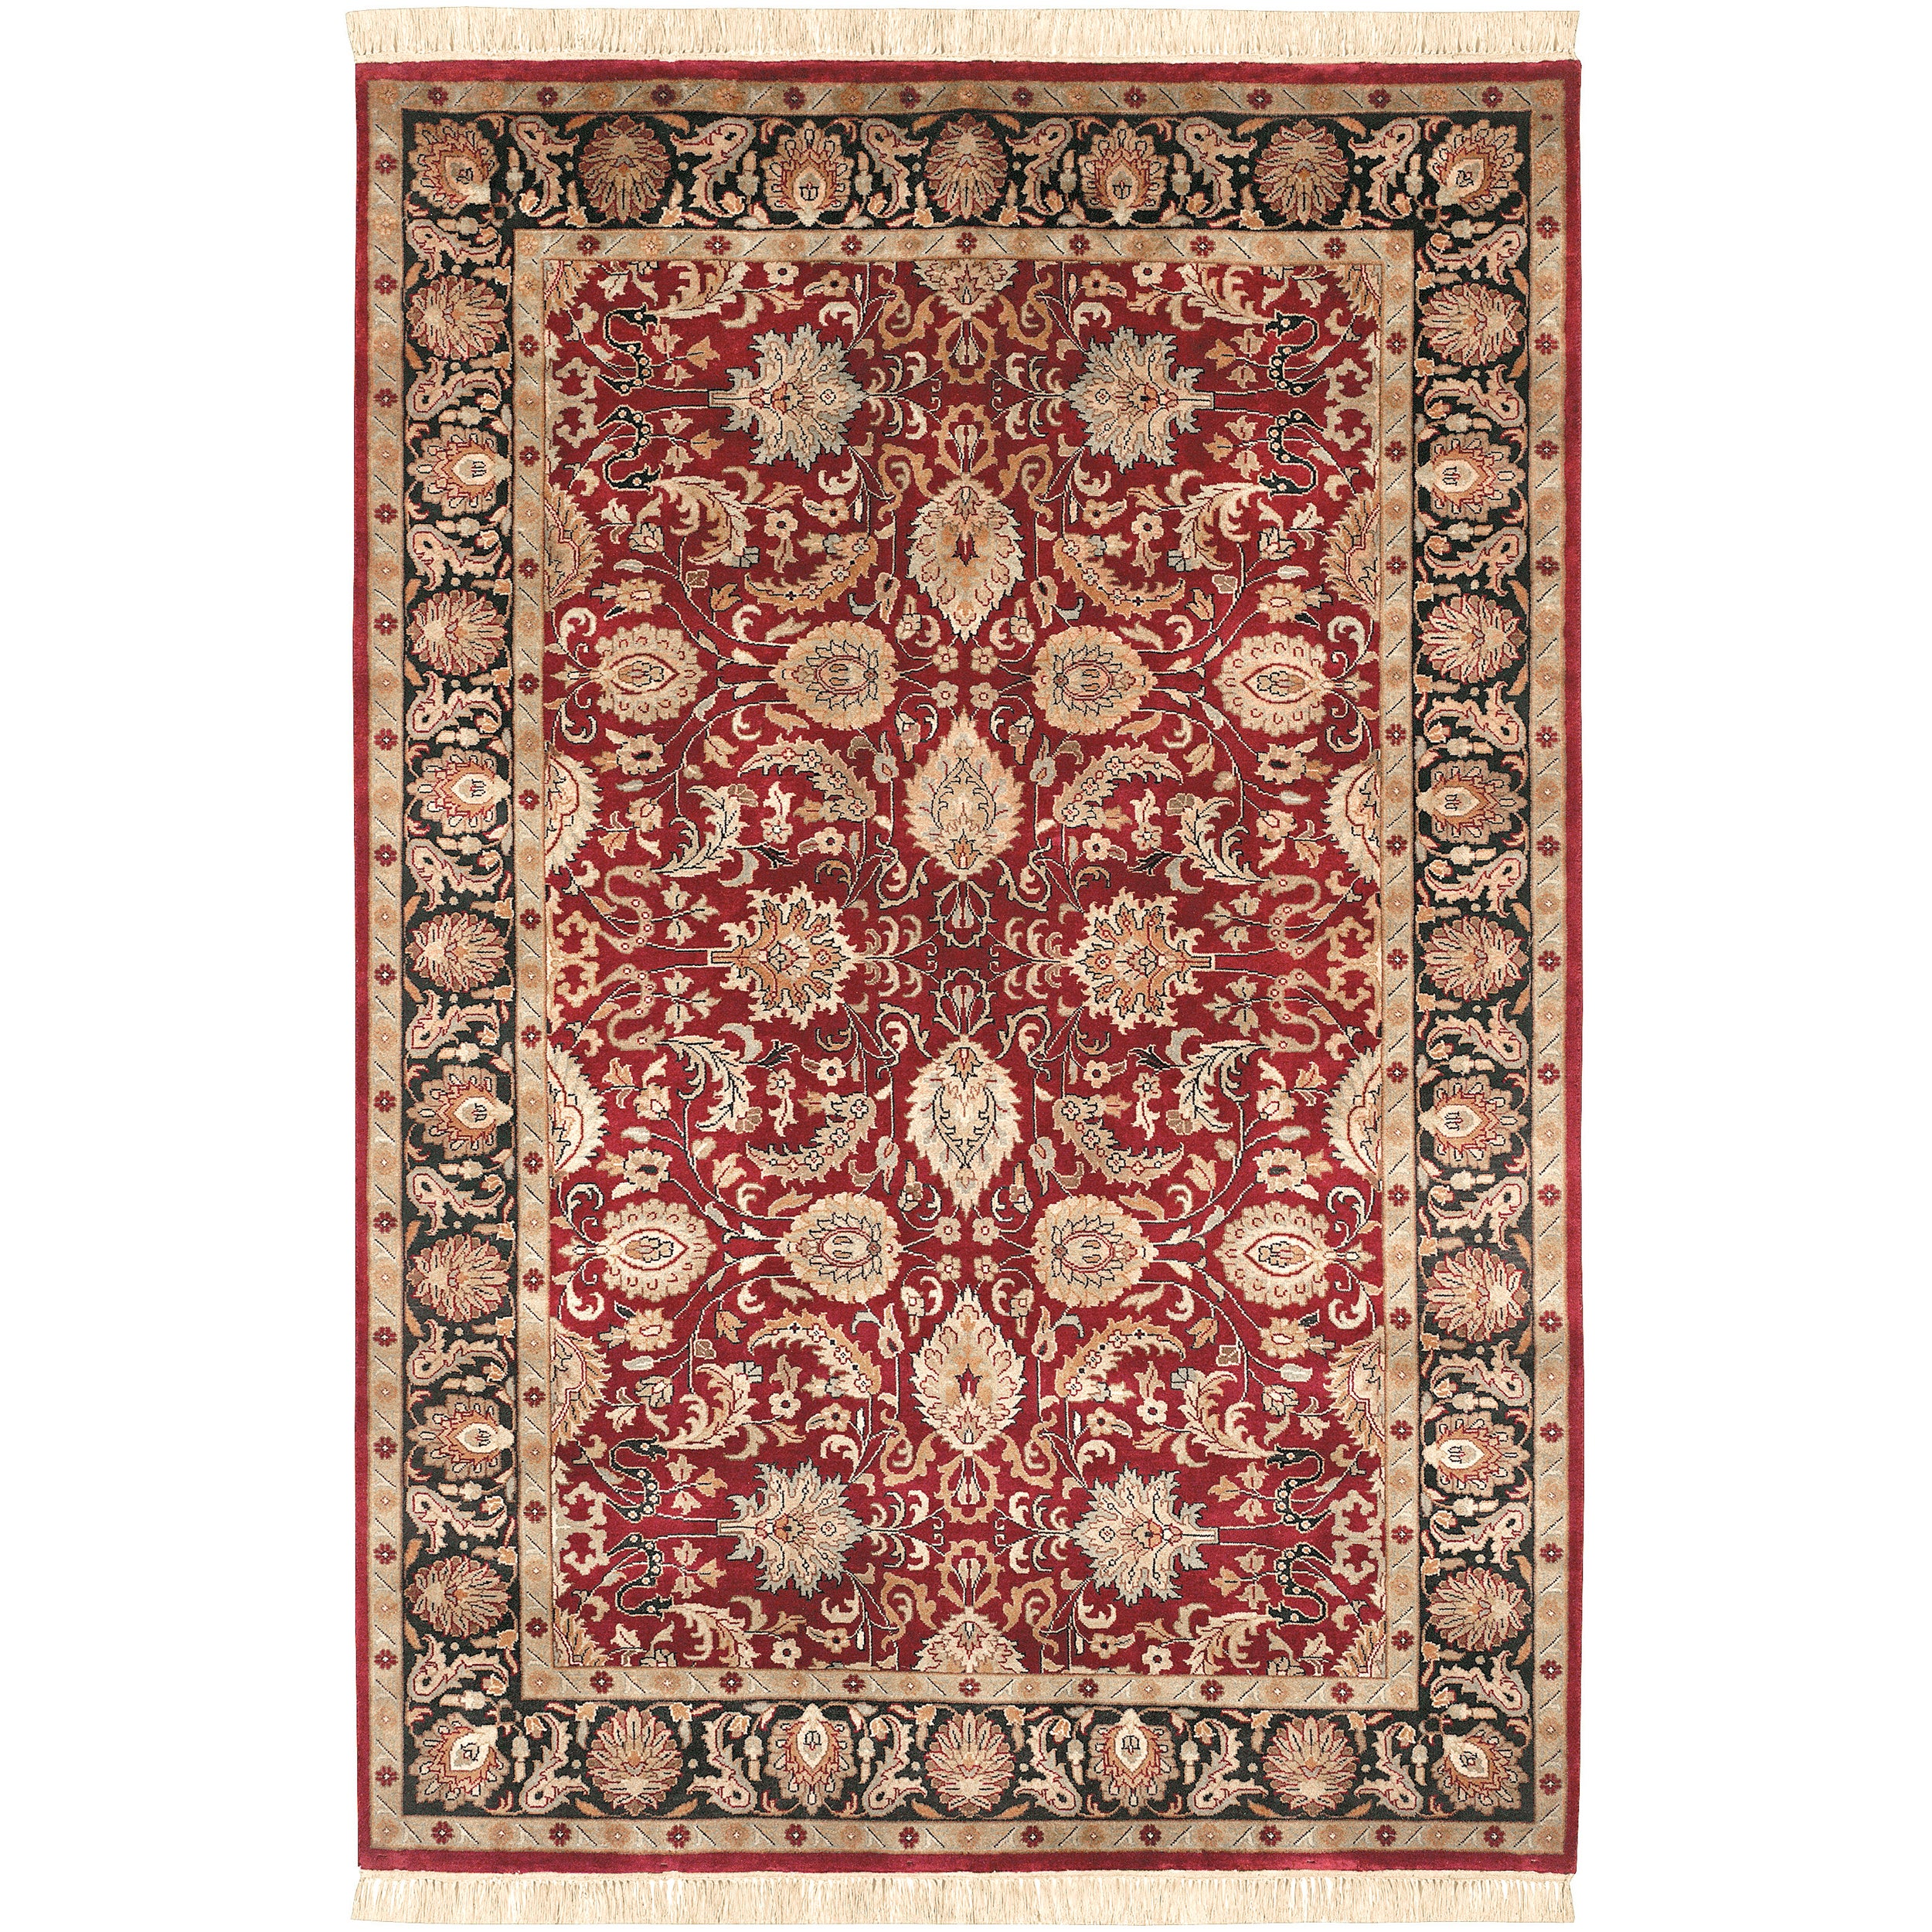 "Hand Knotted Taj Mahal Semi-Worsted New Zealand Wool Rug (3'6"" x 5'6"")"